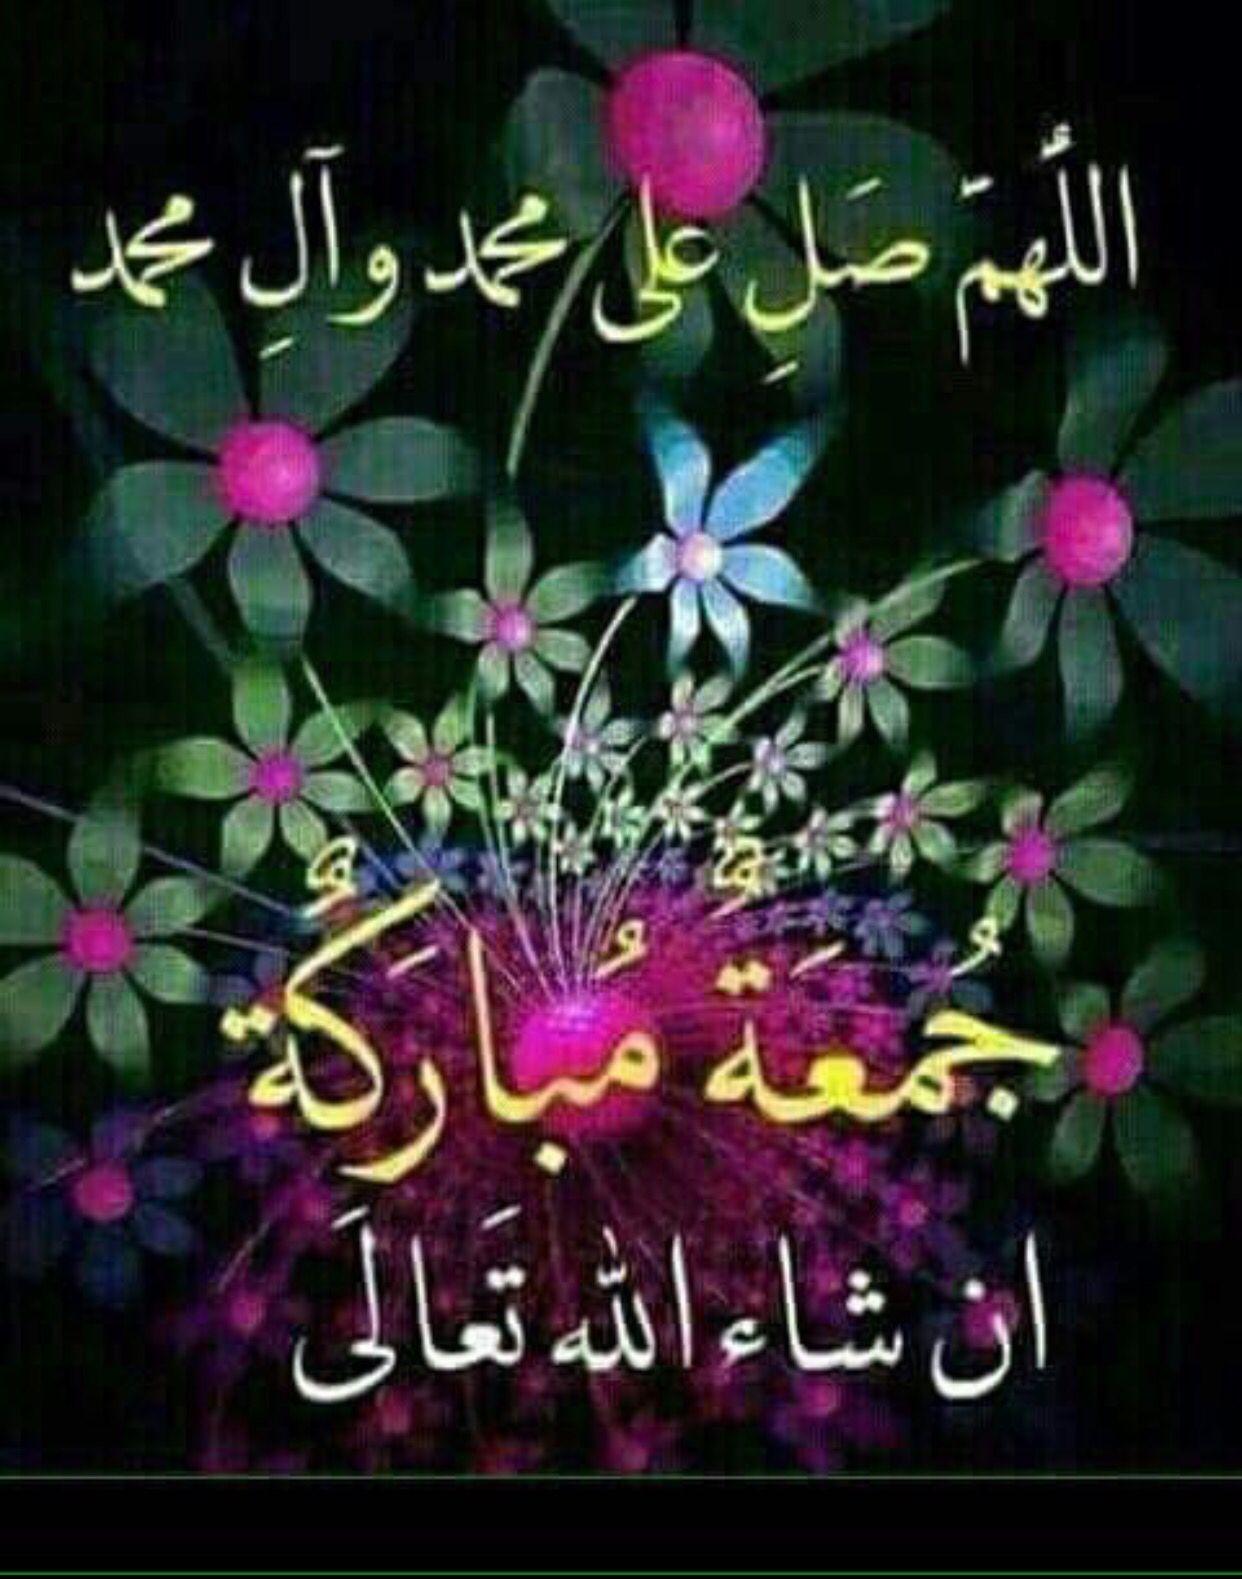 جمعة مباركة Good Morning Flowers Gif Islamic Pictures Jumma Mubarak Images